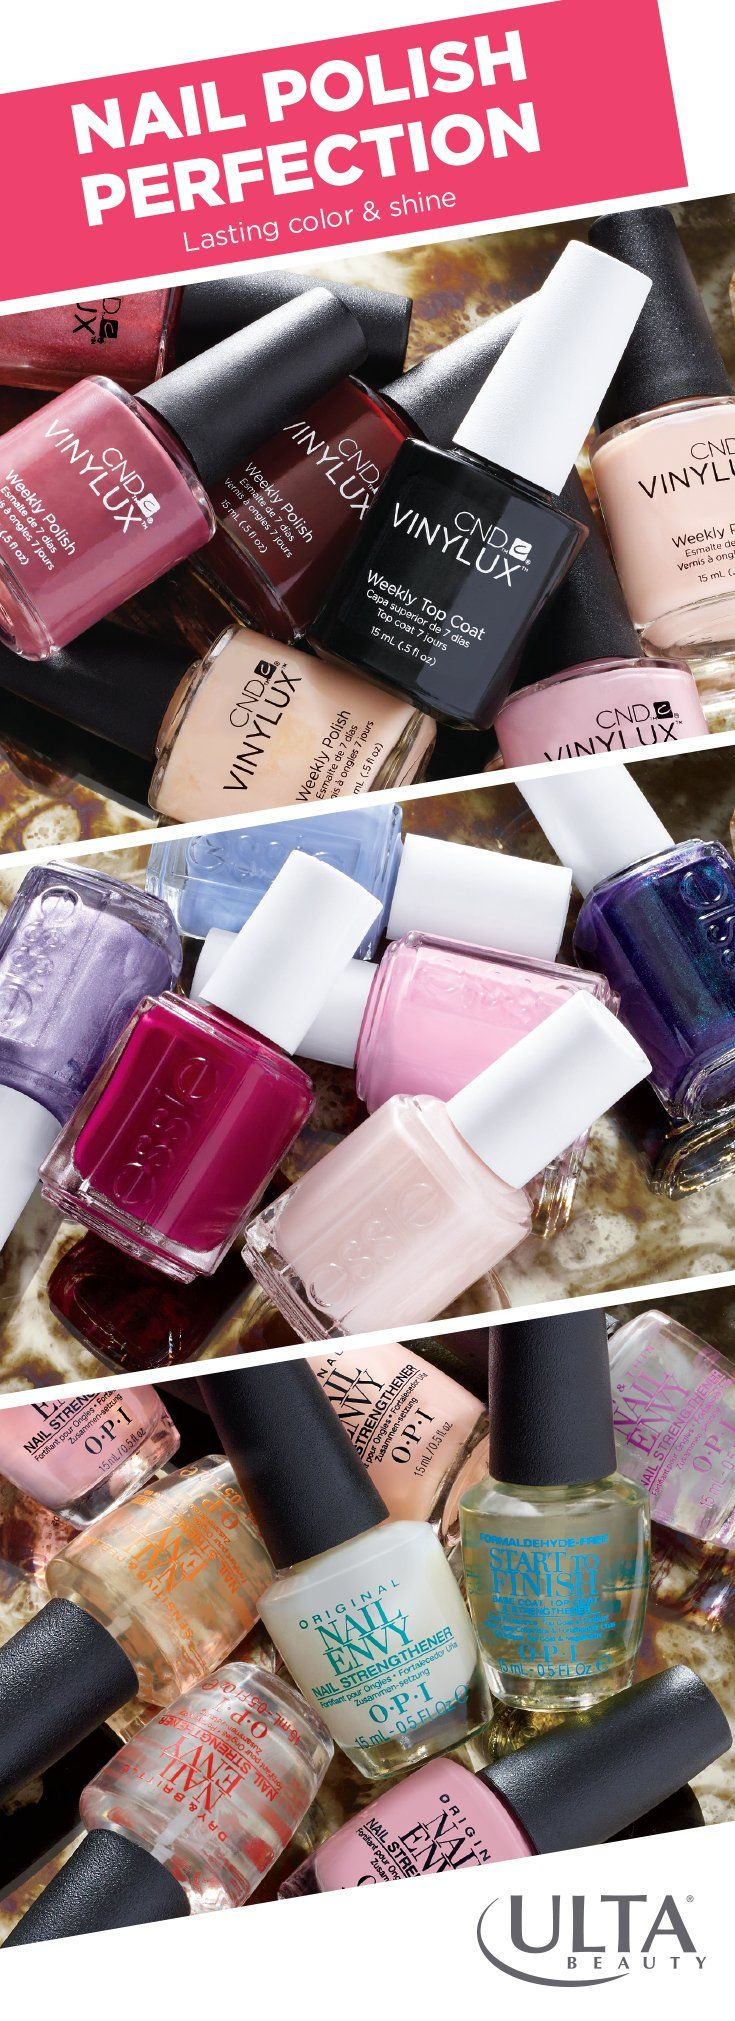 810 best Nailed it! images on Pinterest | Nail polish, Nail polishes ...